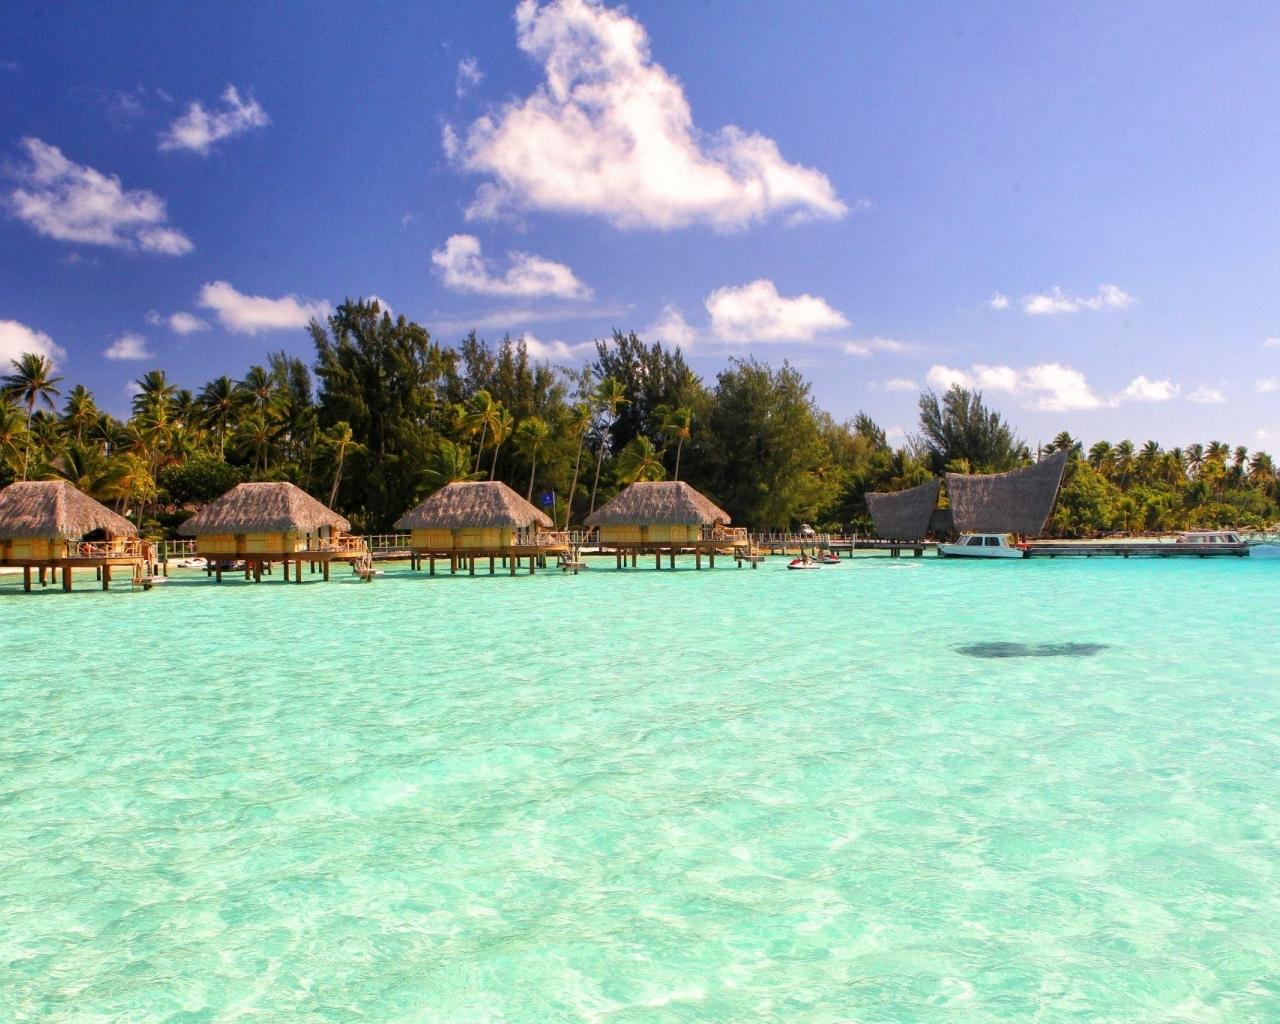 Magnificent Bora Bora Green Blue Lagoon Hd Wallpaper Wallpaper List 1280x1024